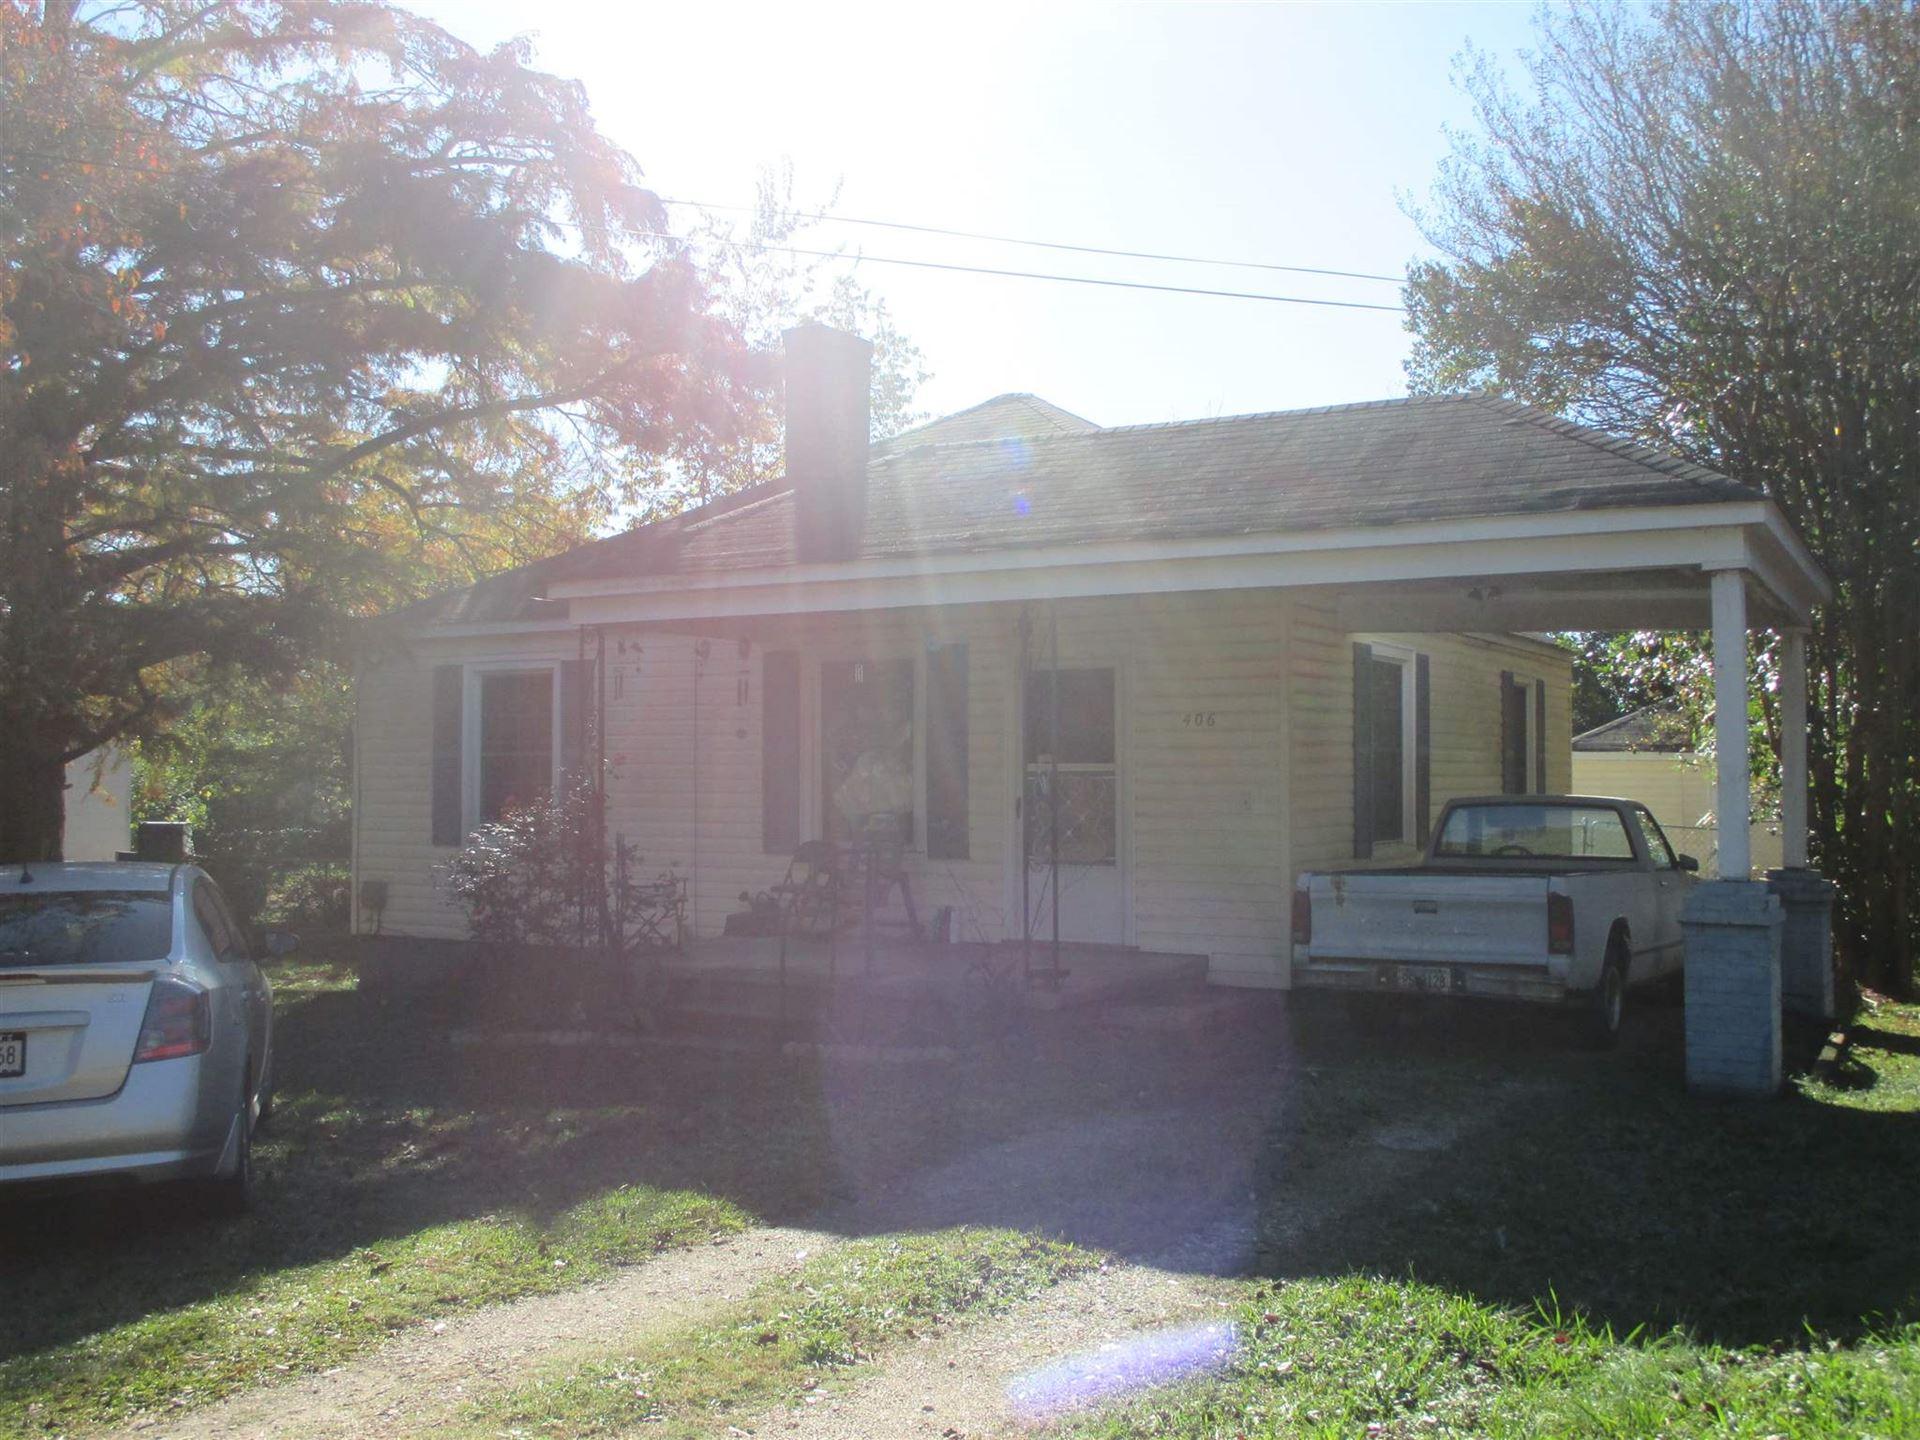 406 Allen St, Thomaston, GA 30286 - MLS#: 8890775